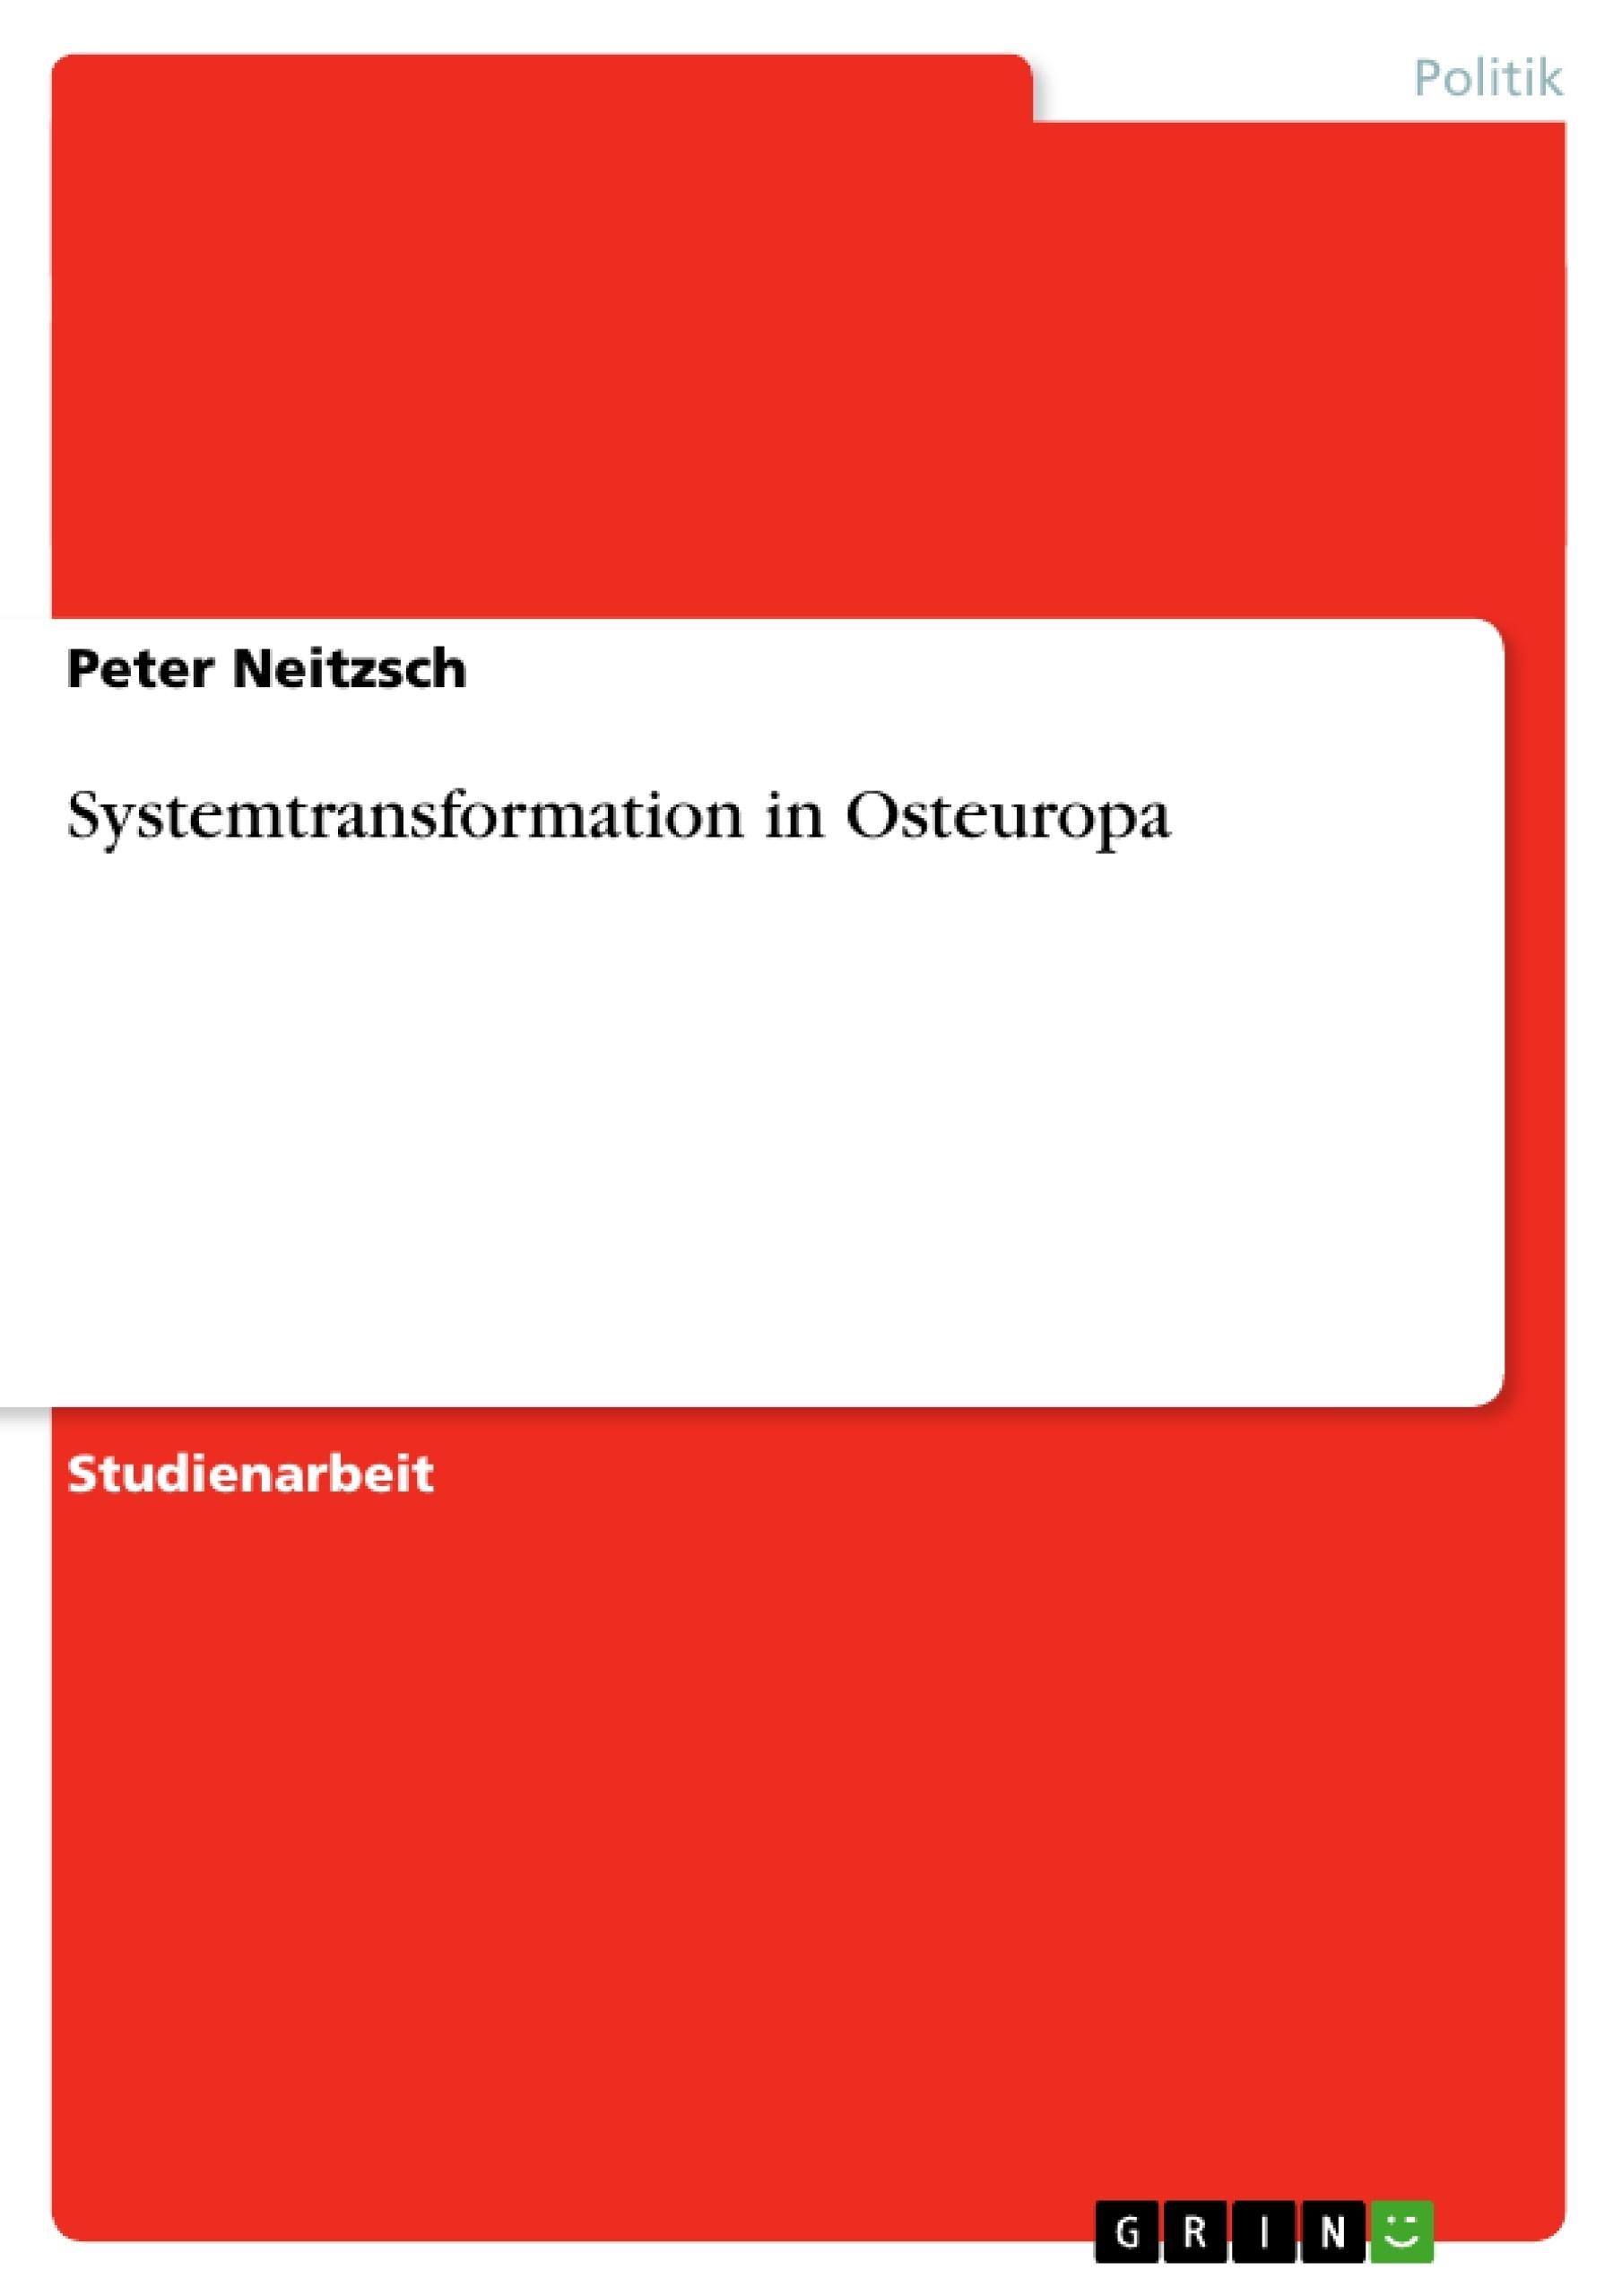 Titel: Systemtransformation in Osteuropa